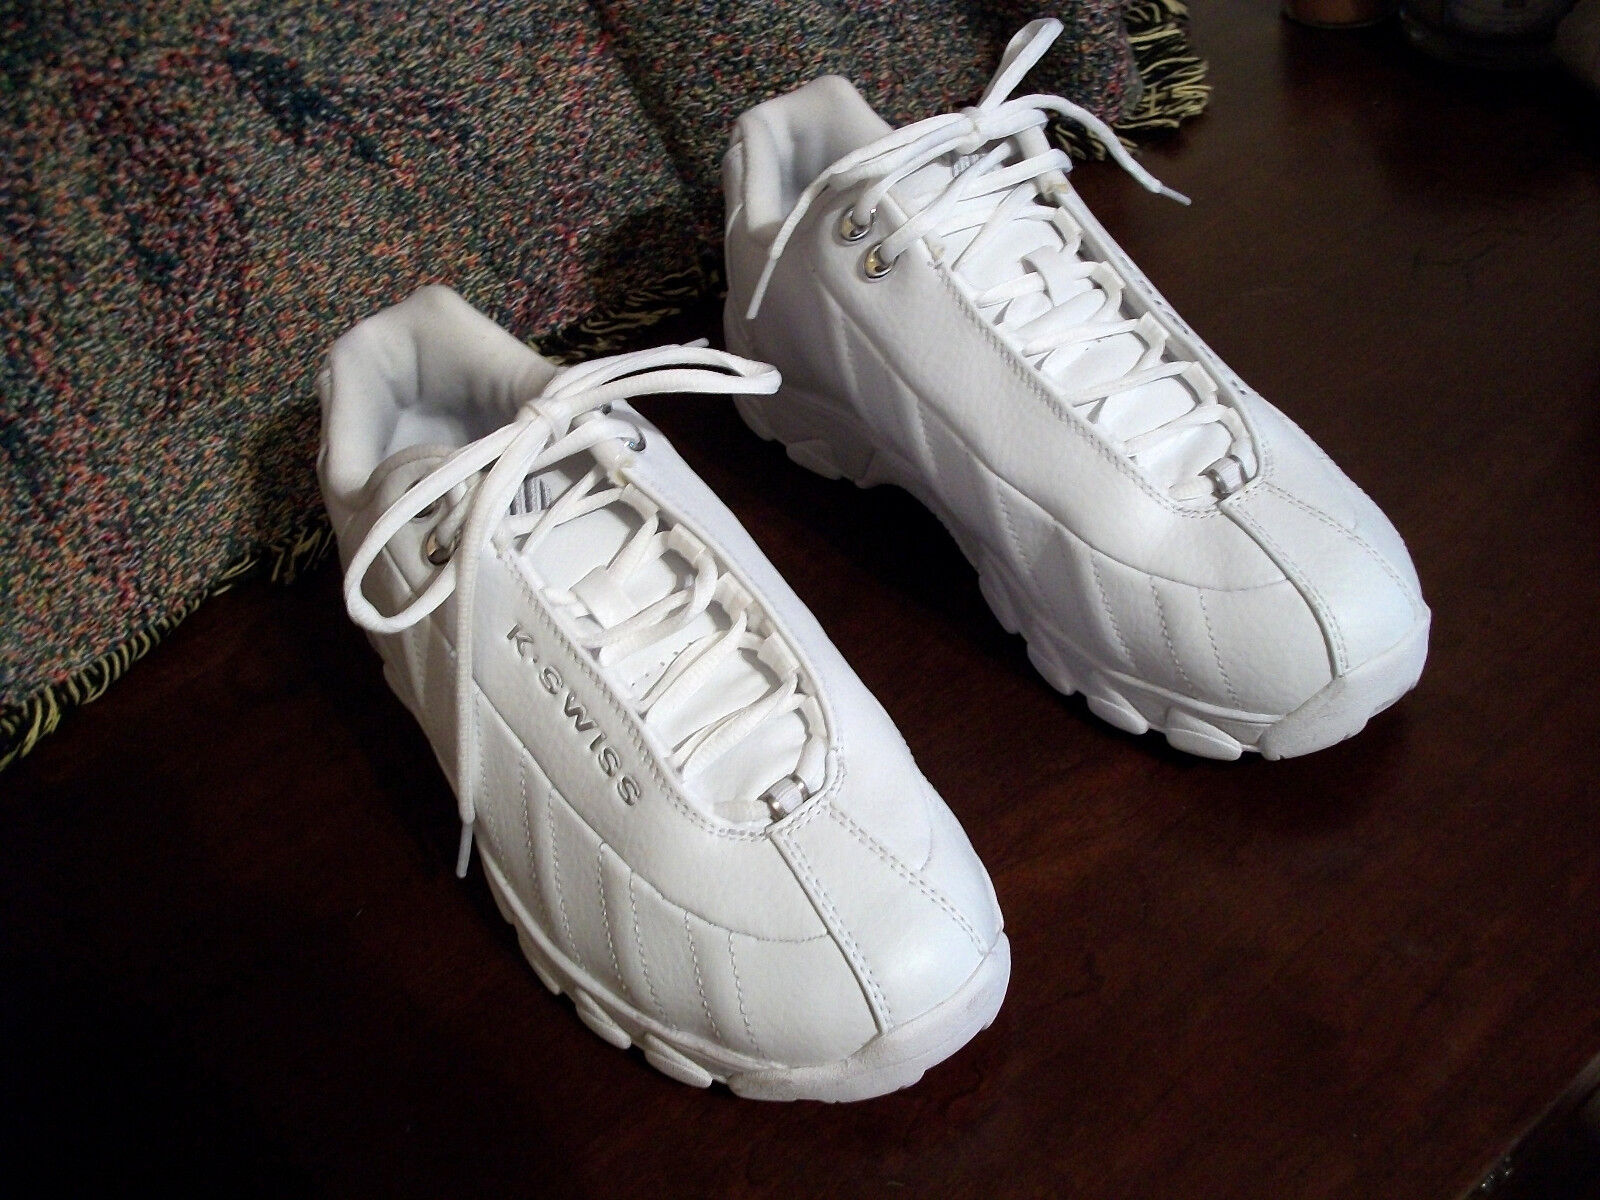 K SWISS blancoo MEMORY FOAM Cuero de Resorte de choque SS Zapatos Atléticos 8.5  Excelente